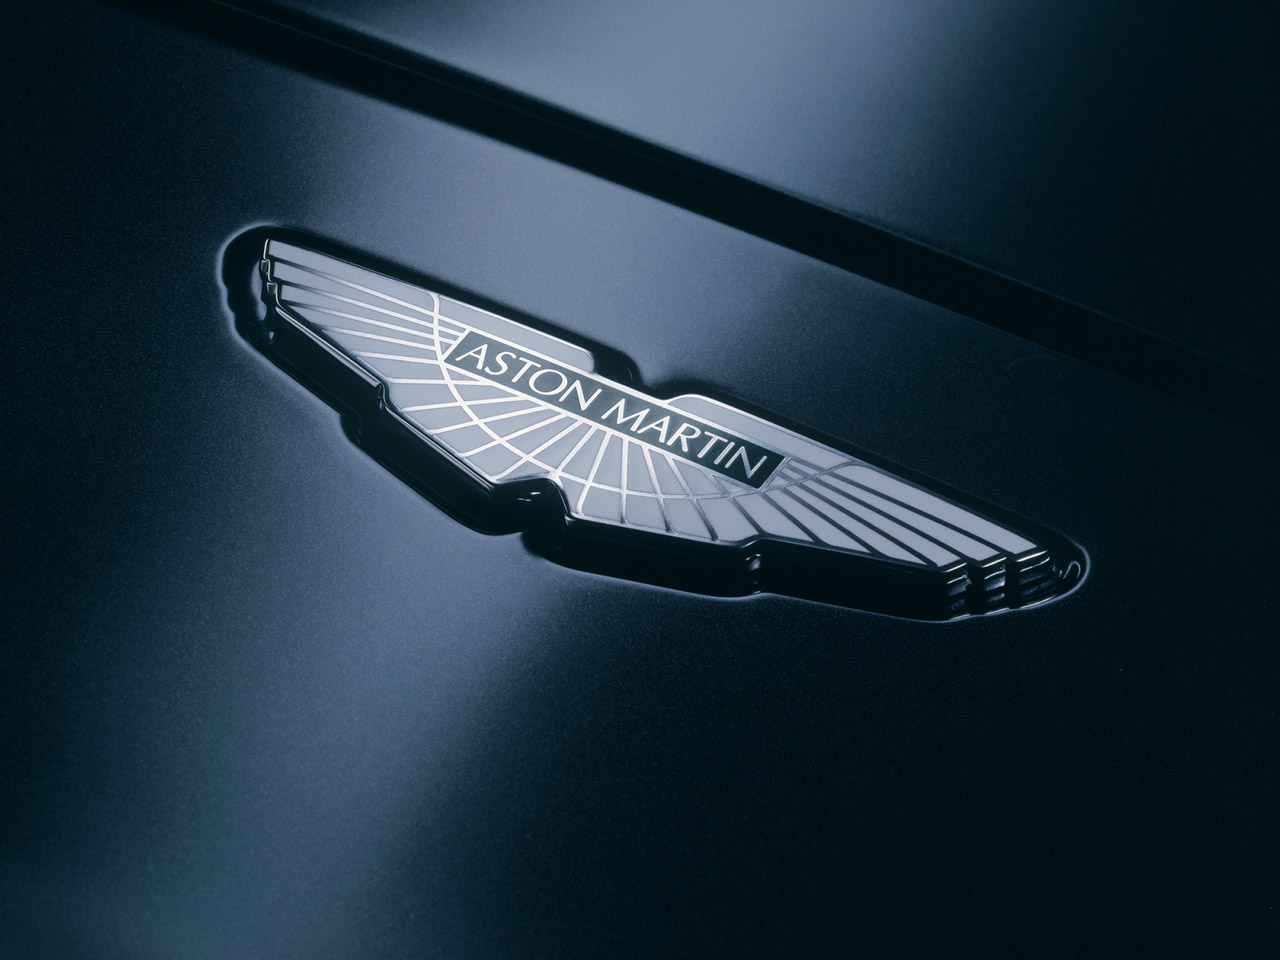 British Aston martin logos company